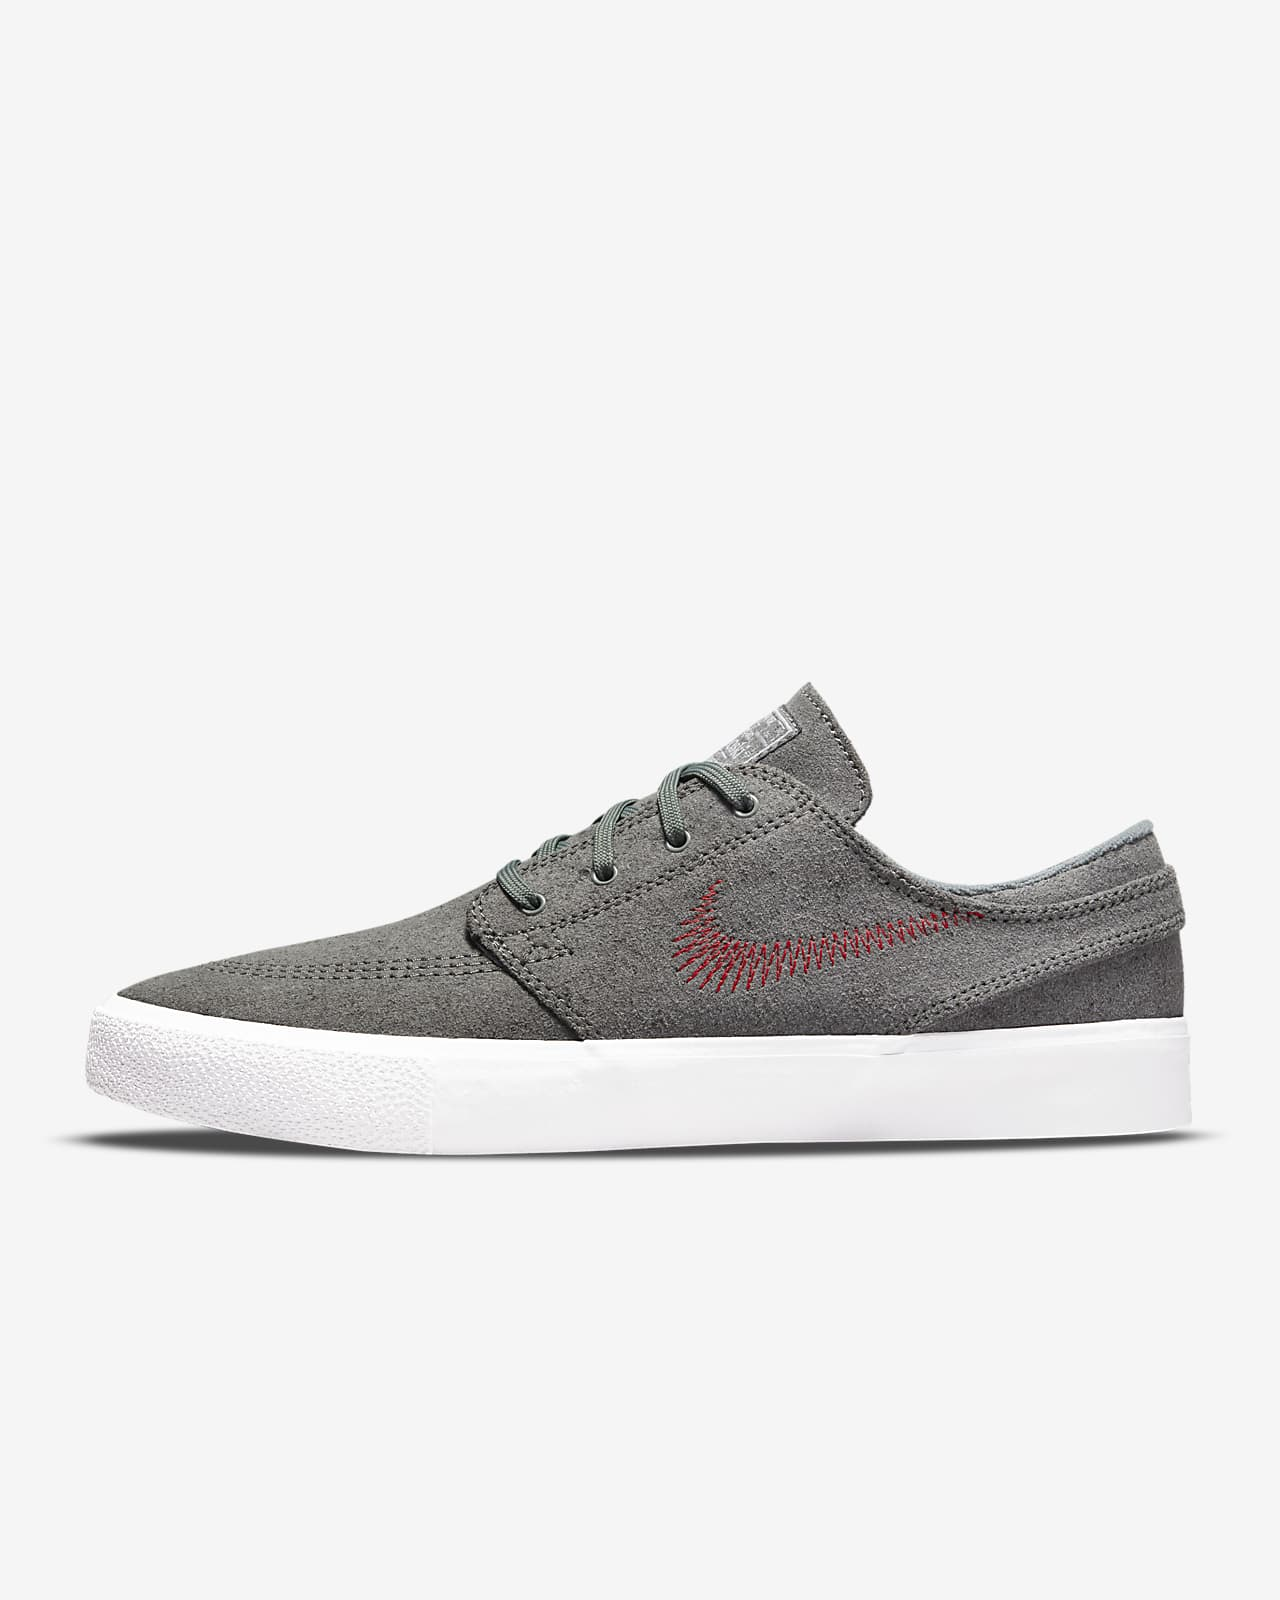 Skateboardsko Nike SB Zoom Stefan Janoski FL RM